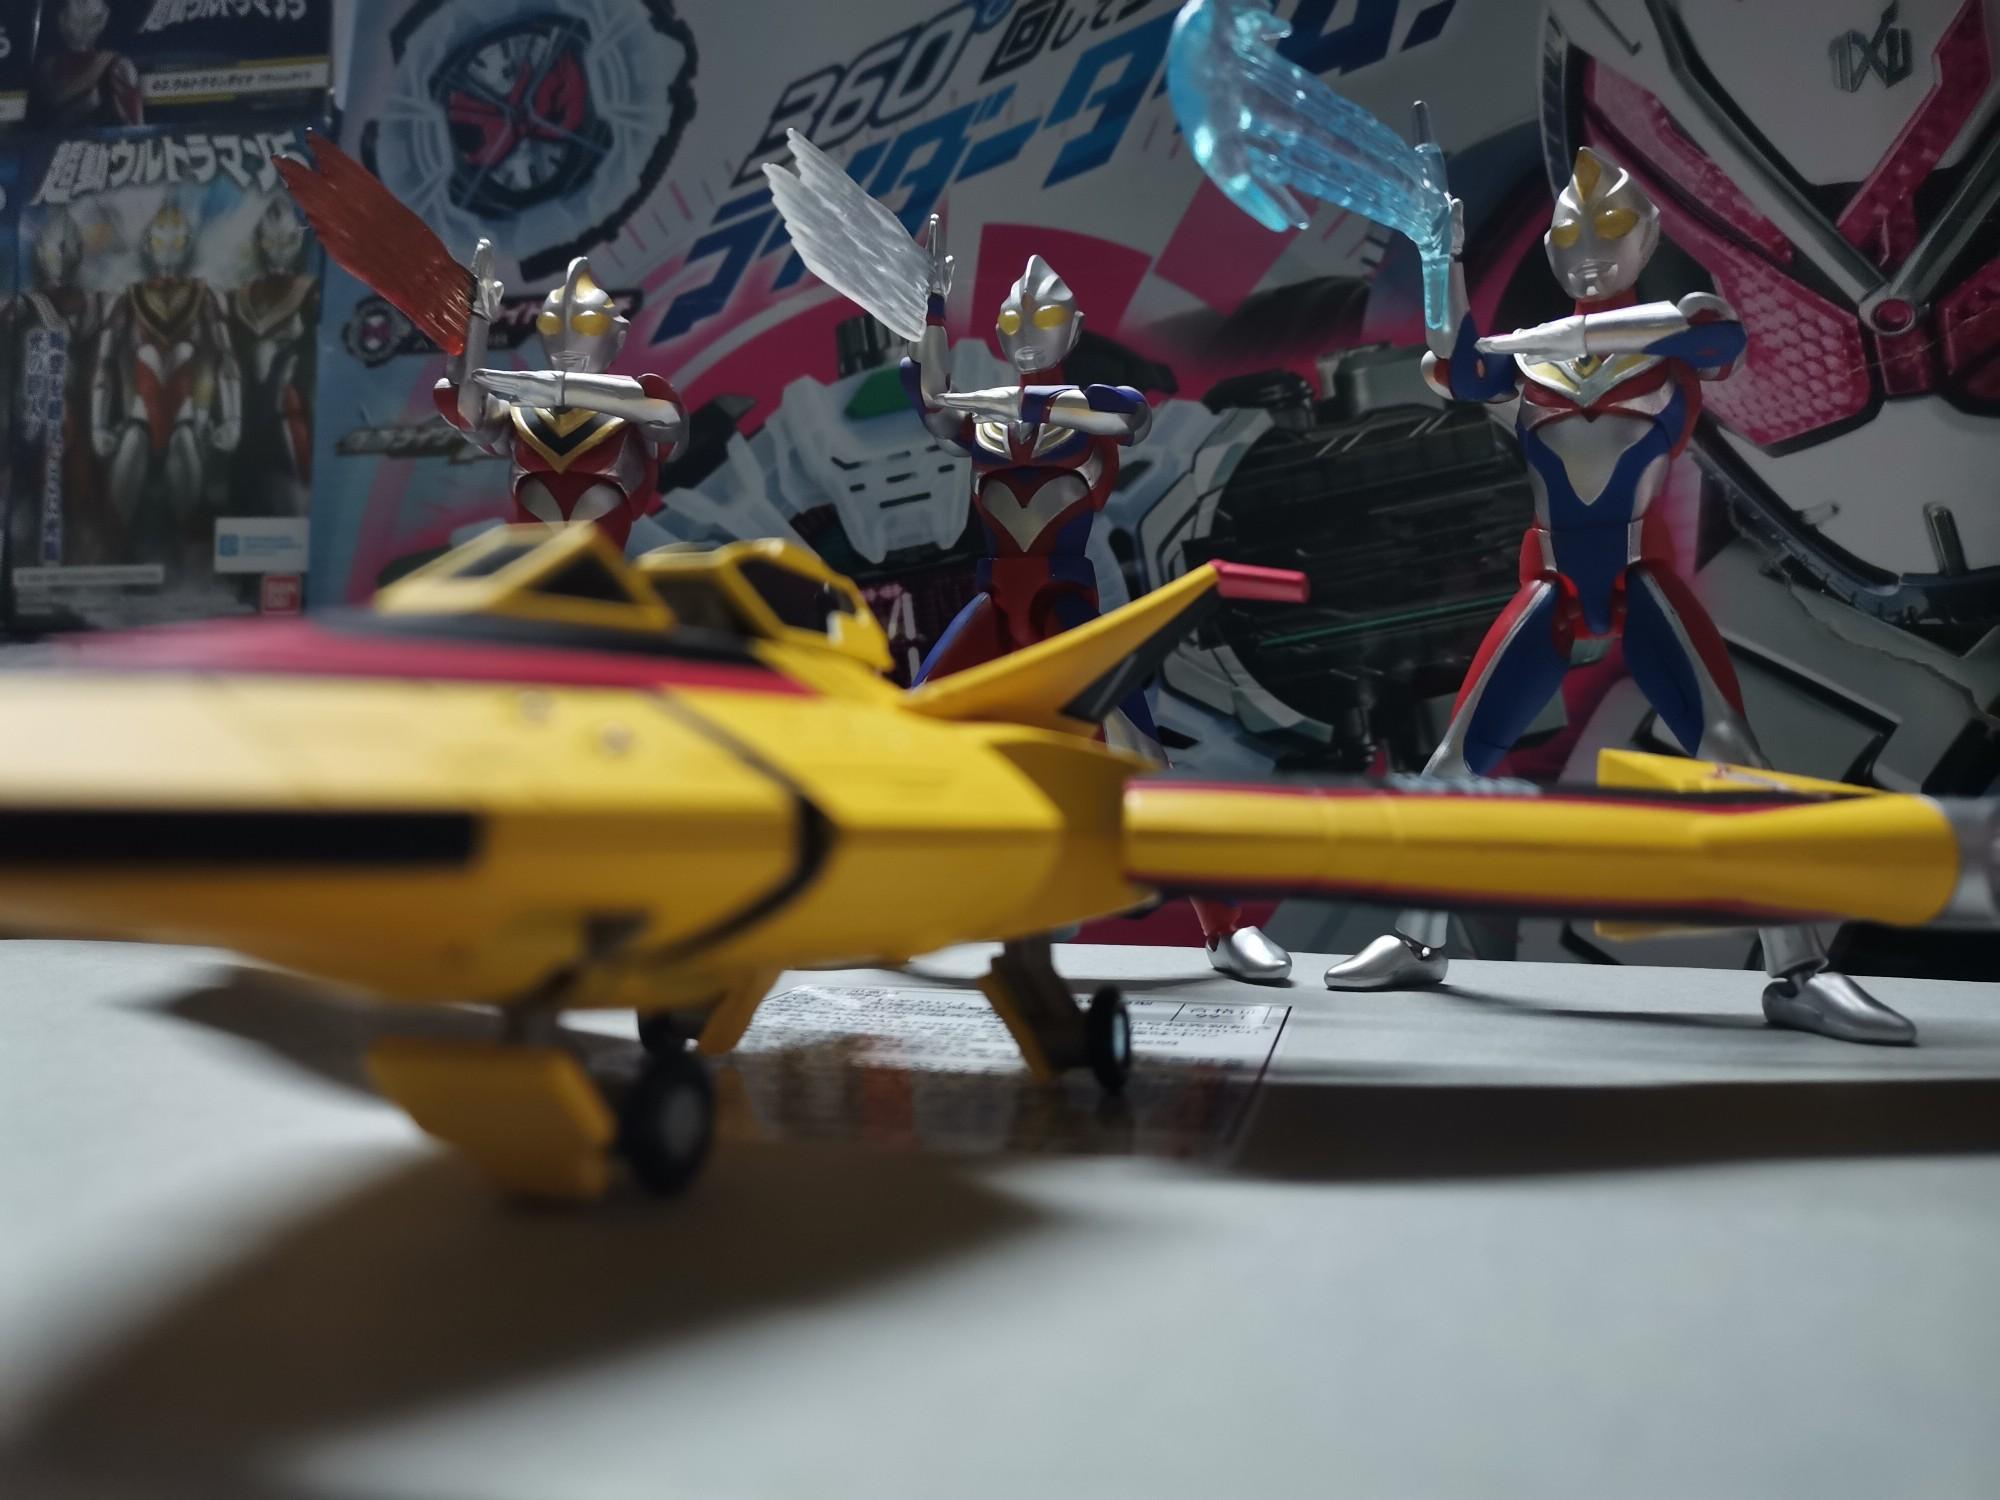 ? Ultramans hand-held food game Super action 123456 rob Rogge, saiwendijia, dinagaia, heiob food.